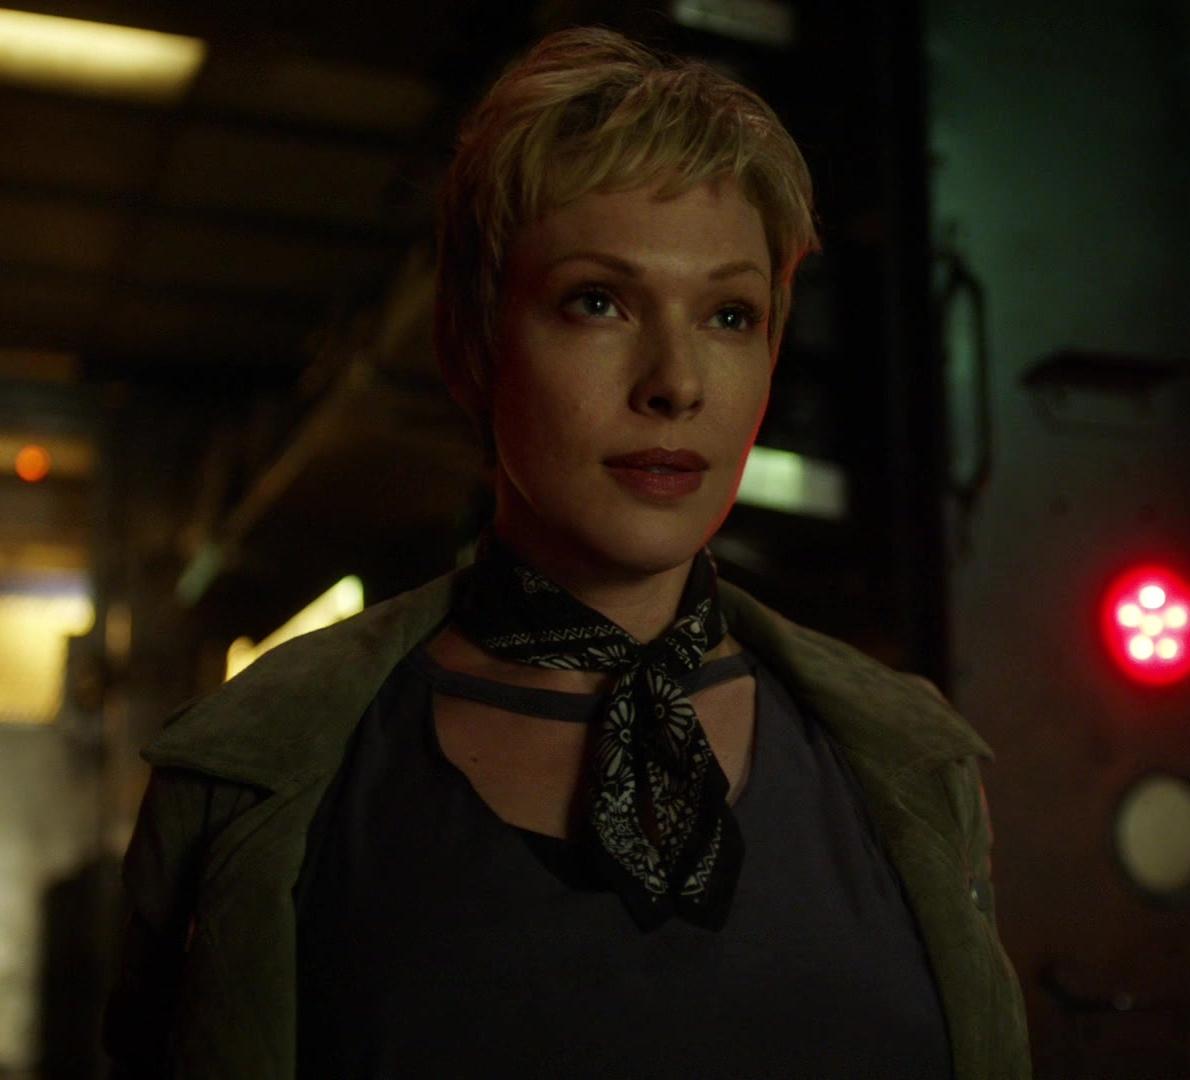 Vanessa Jansen (Arrowverse)